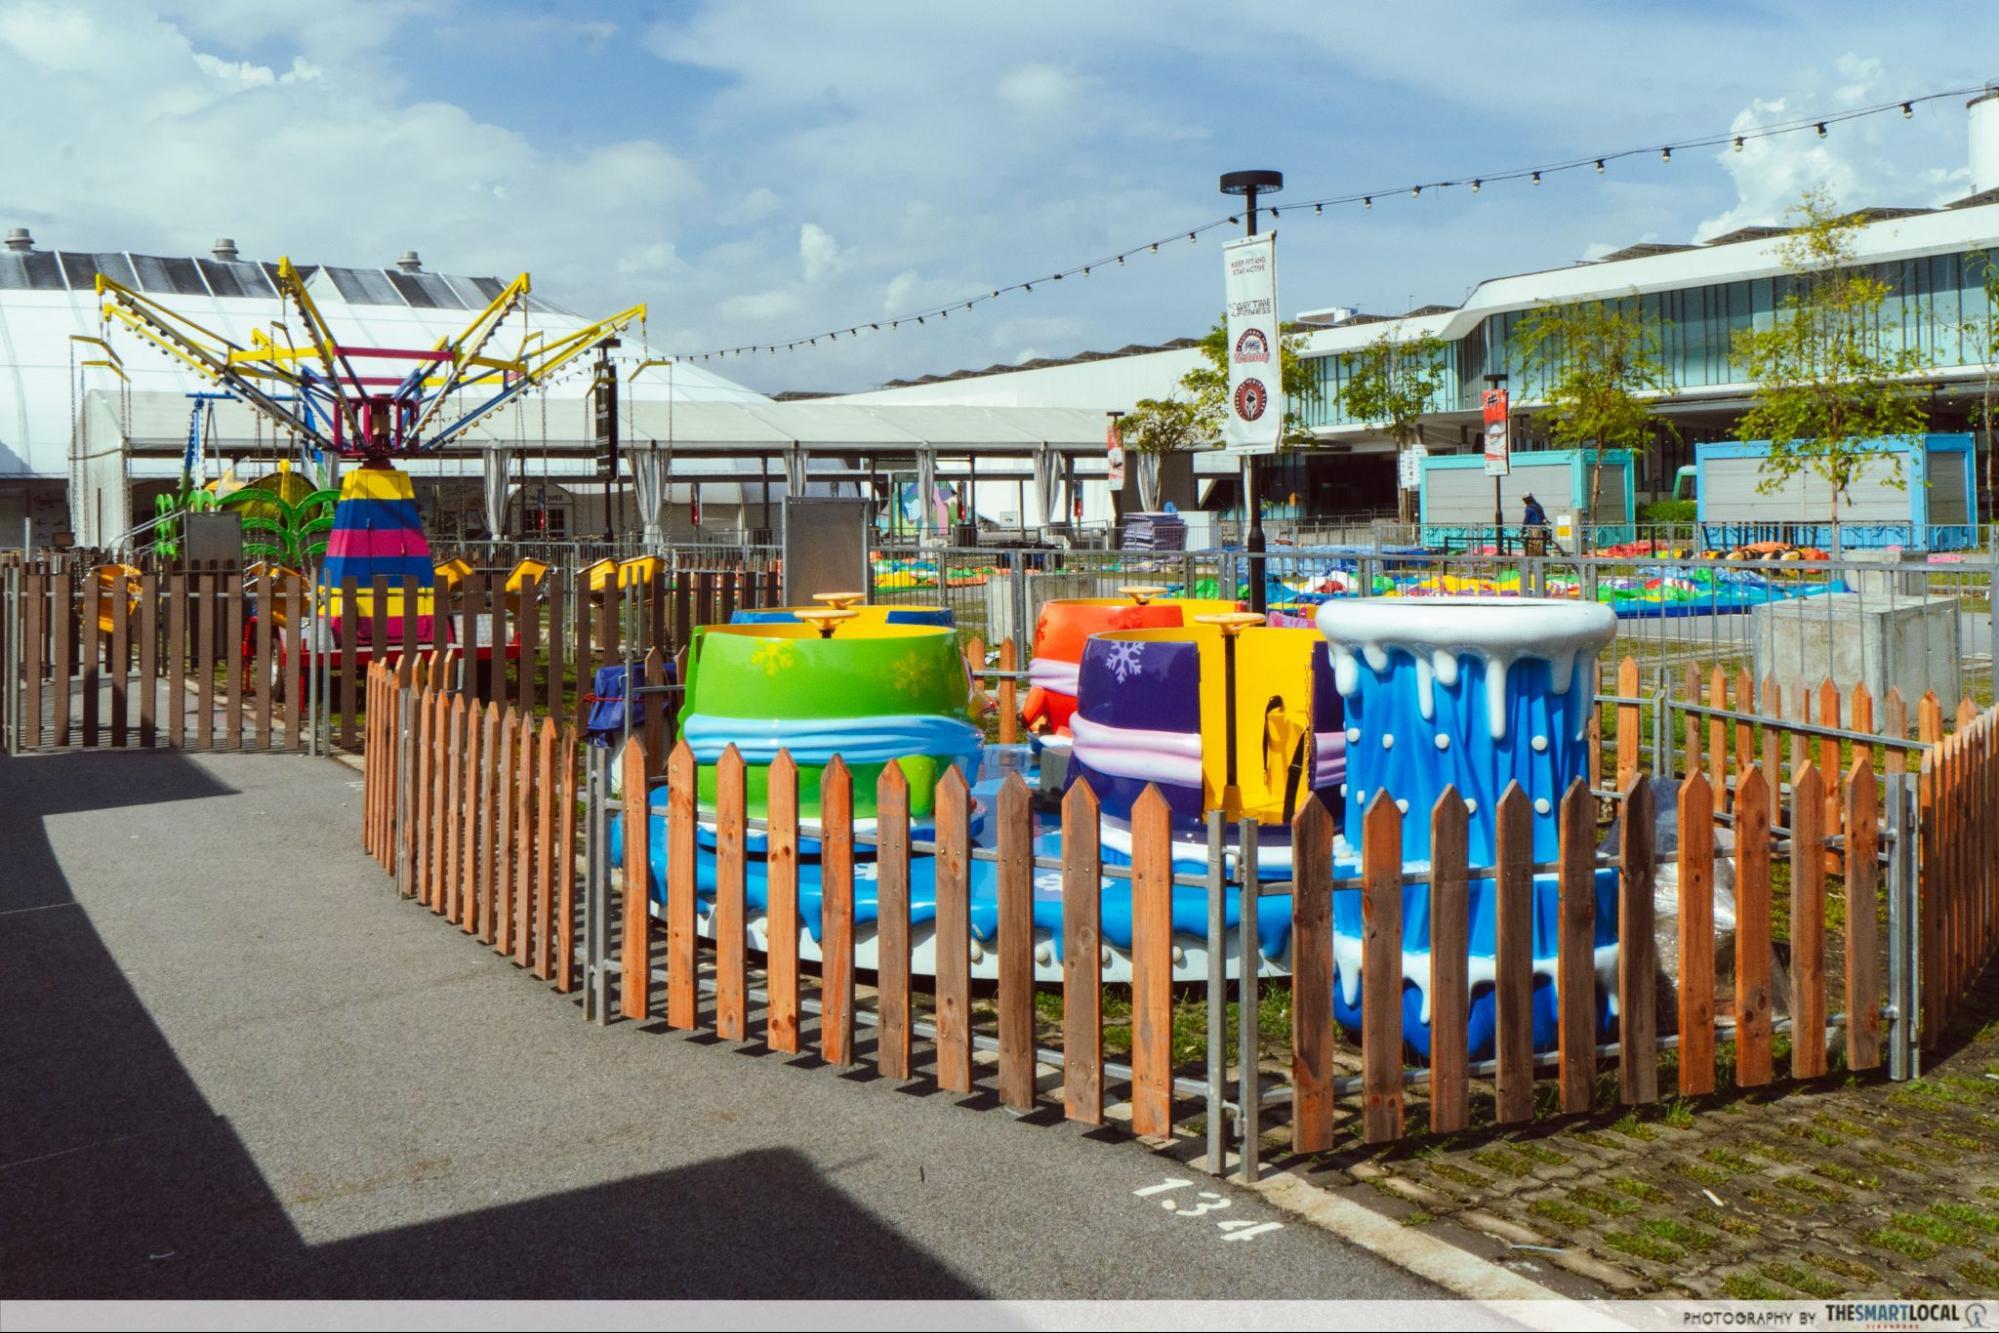 SG hotel on wheels - carnival